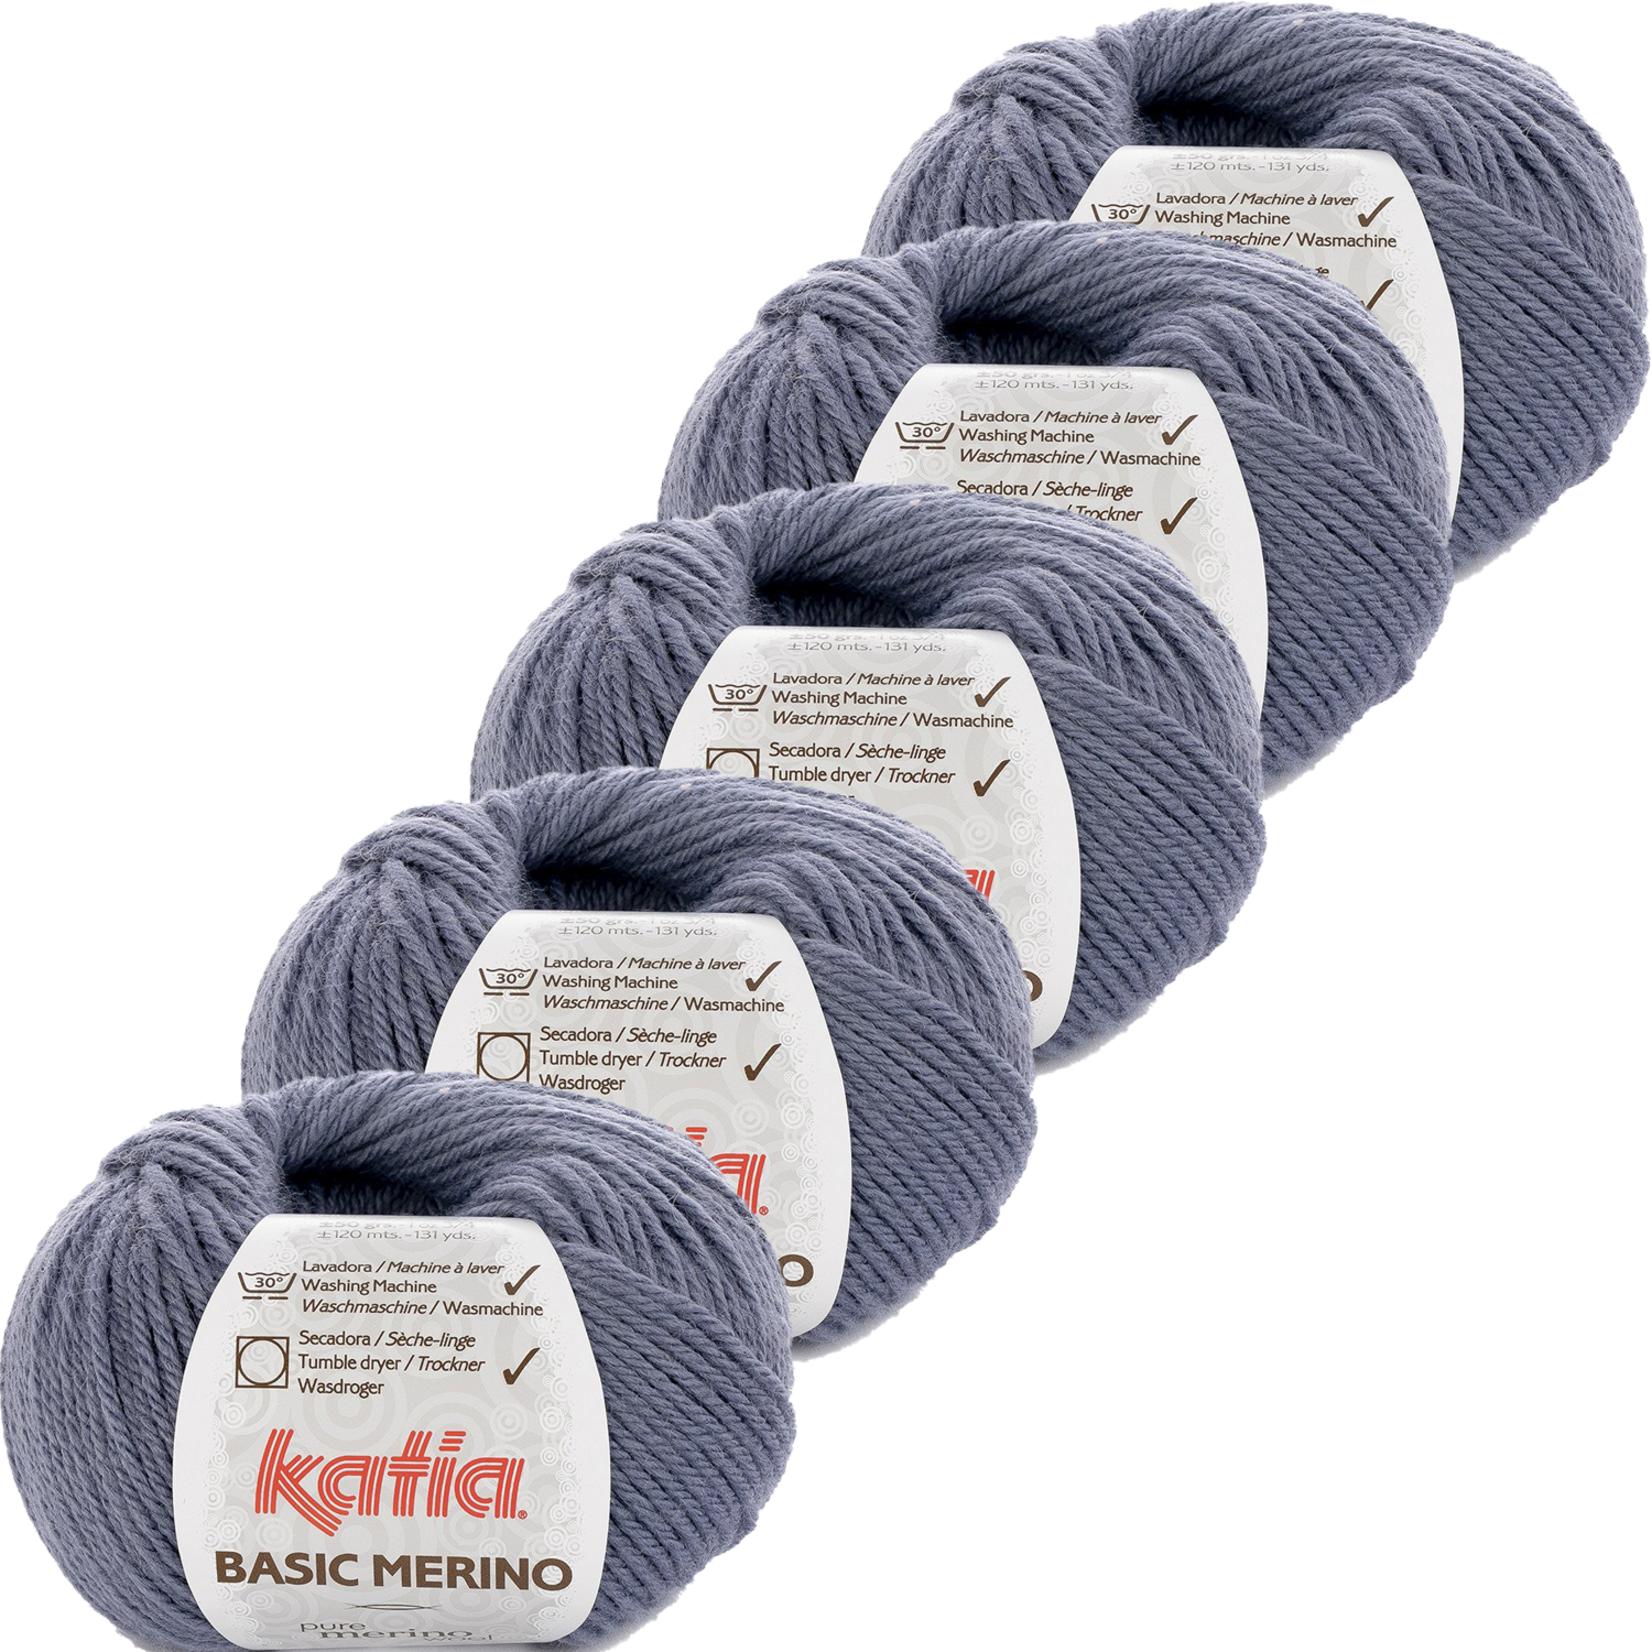 Katia Basic Merino - kleur 72_Jeans - bundel 5 bollen 50 gr.  van 120 m.